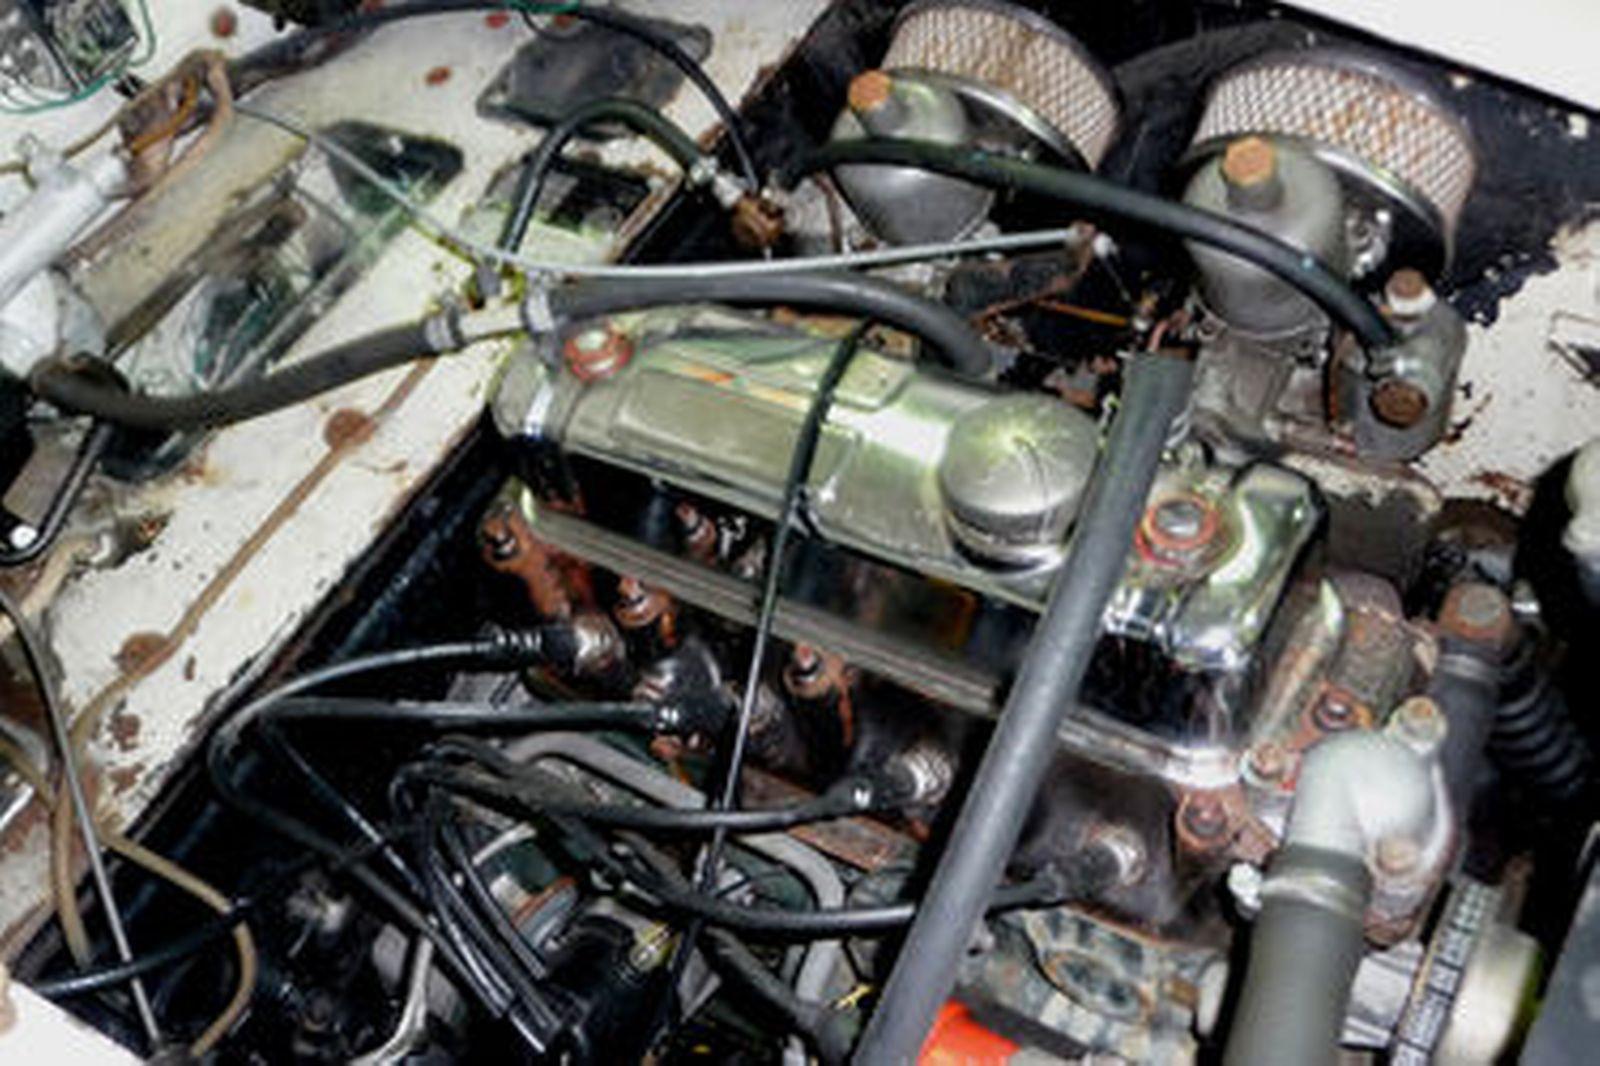 MGA 1500 Mk1 Roadster